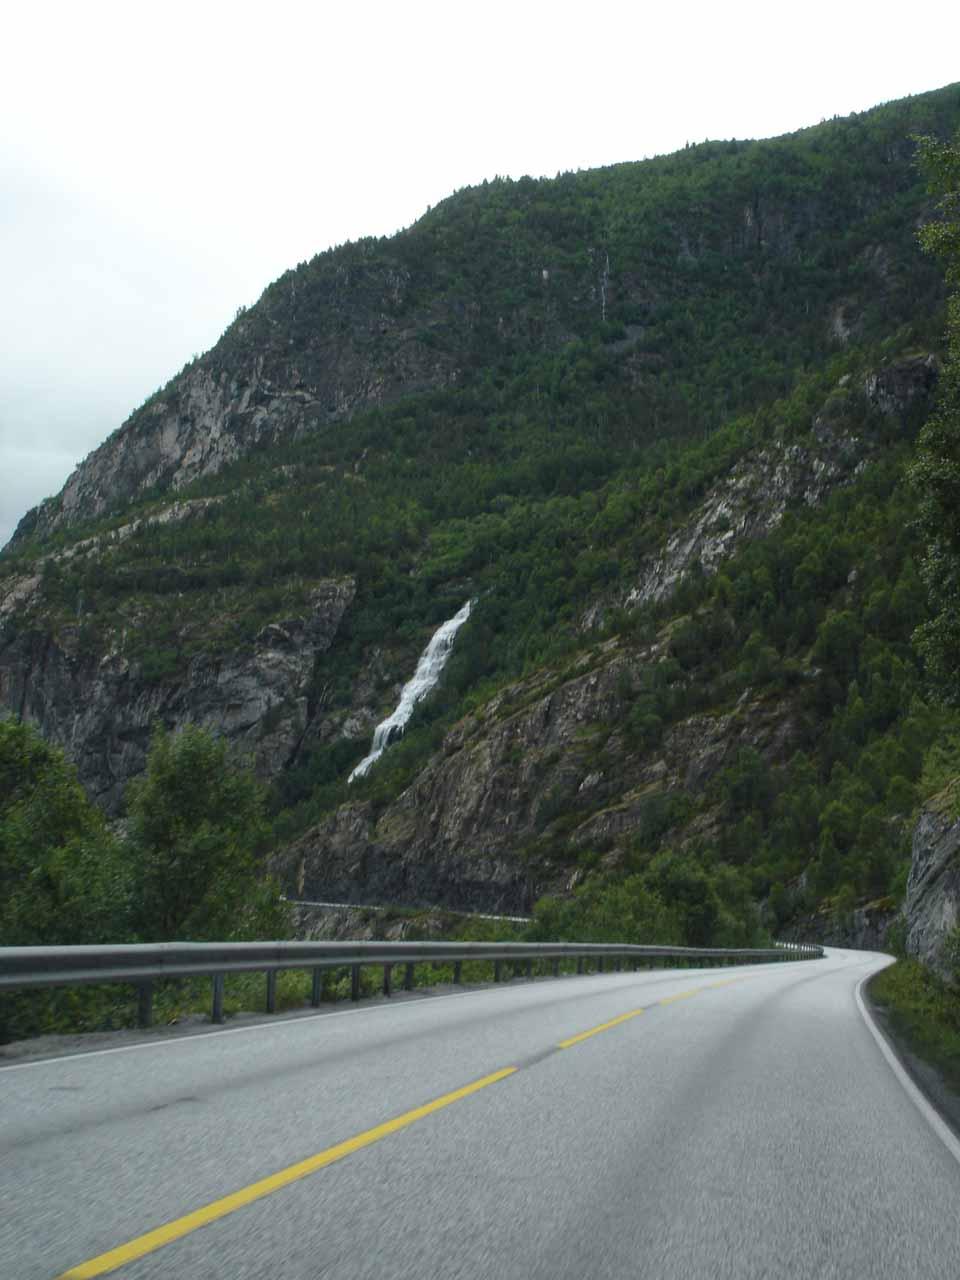 On the Utladalsvegen somewhere near Øvre Årdal as we were approaching some waterfall